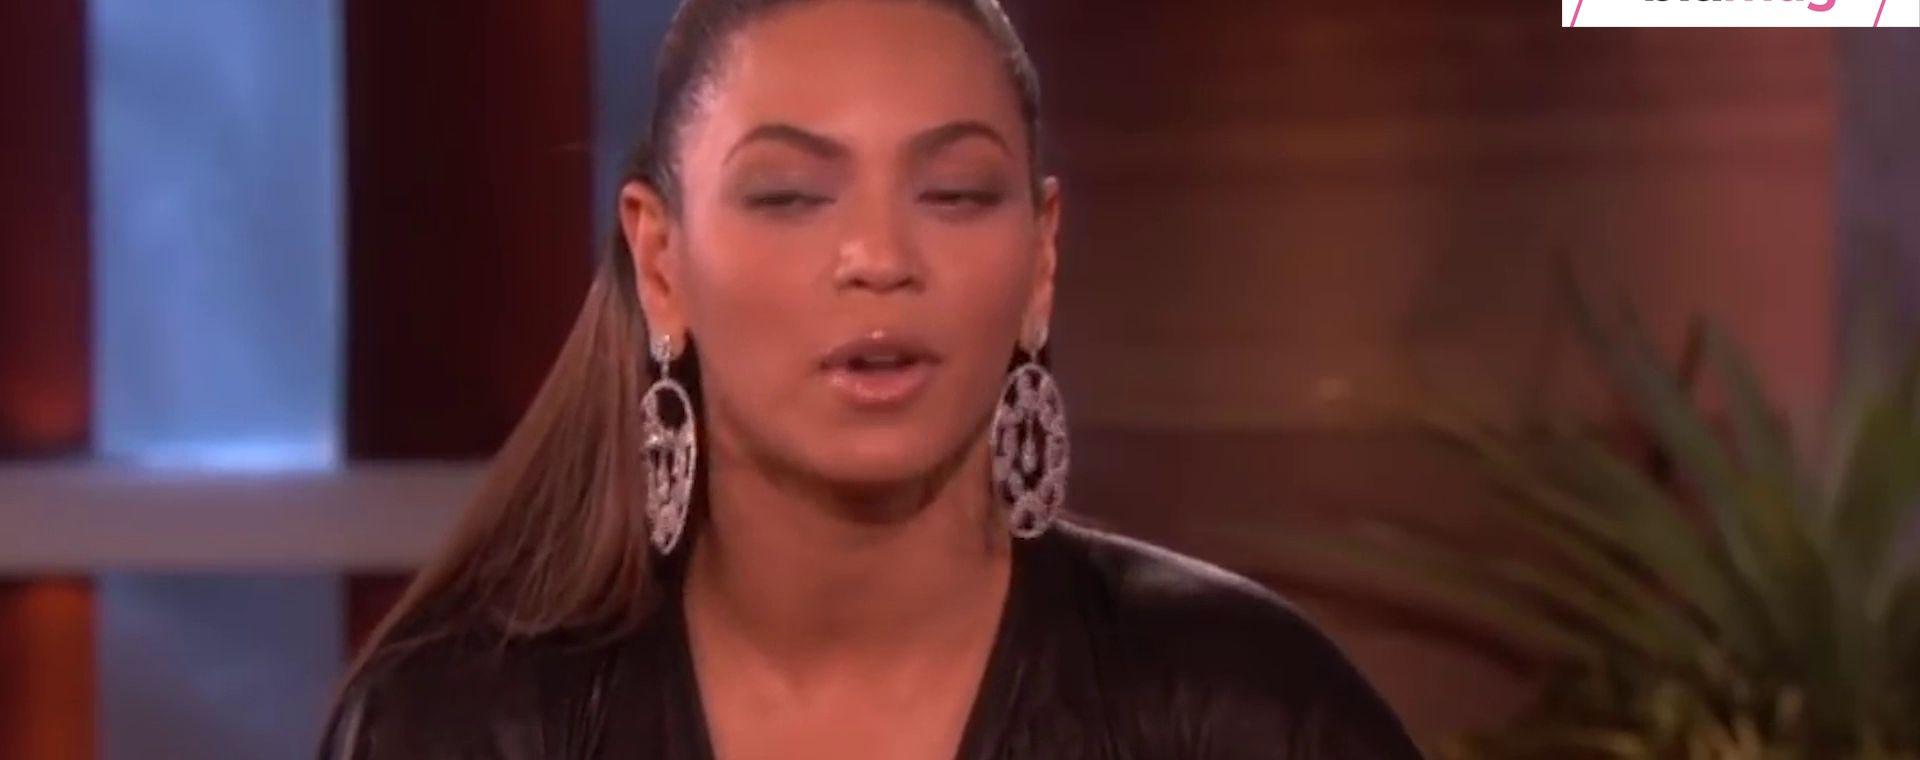 Beyoncé's cousin